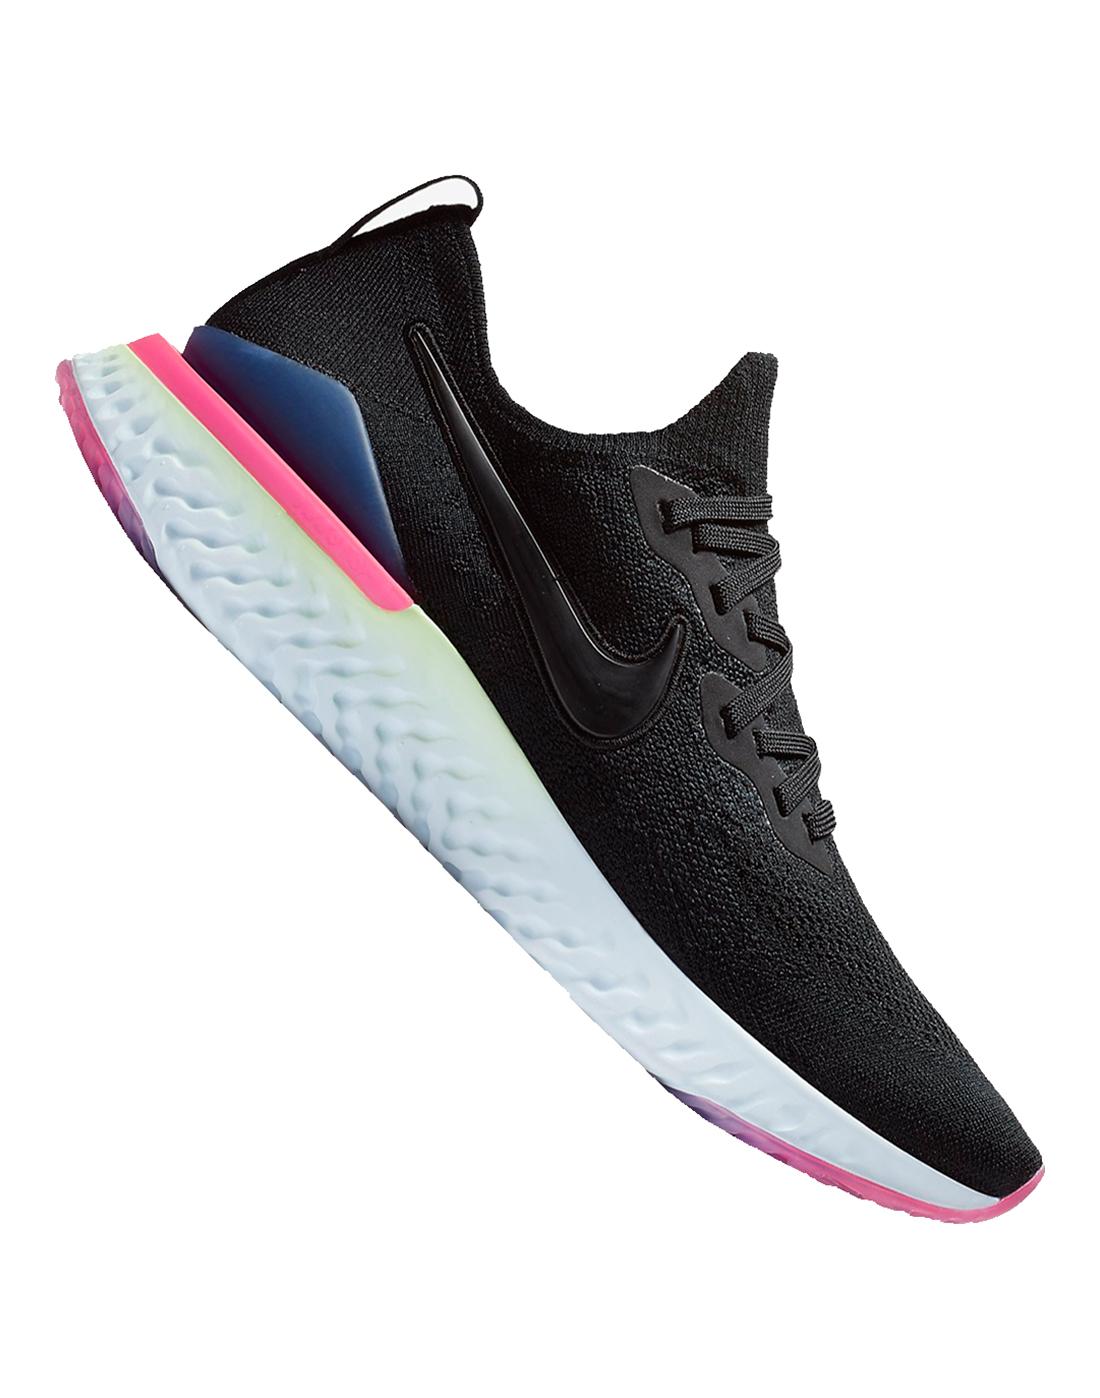 4b1d7aa7d64db Men s Black Nike Epic React Flyknit 2